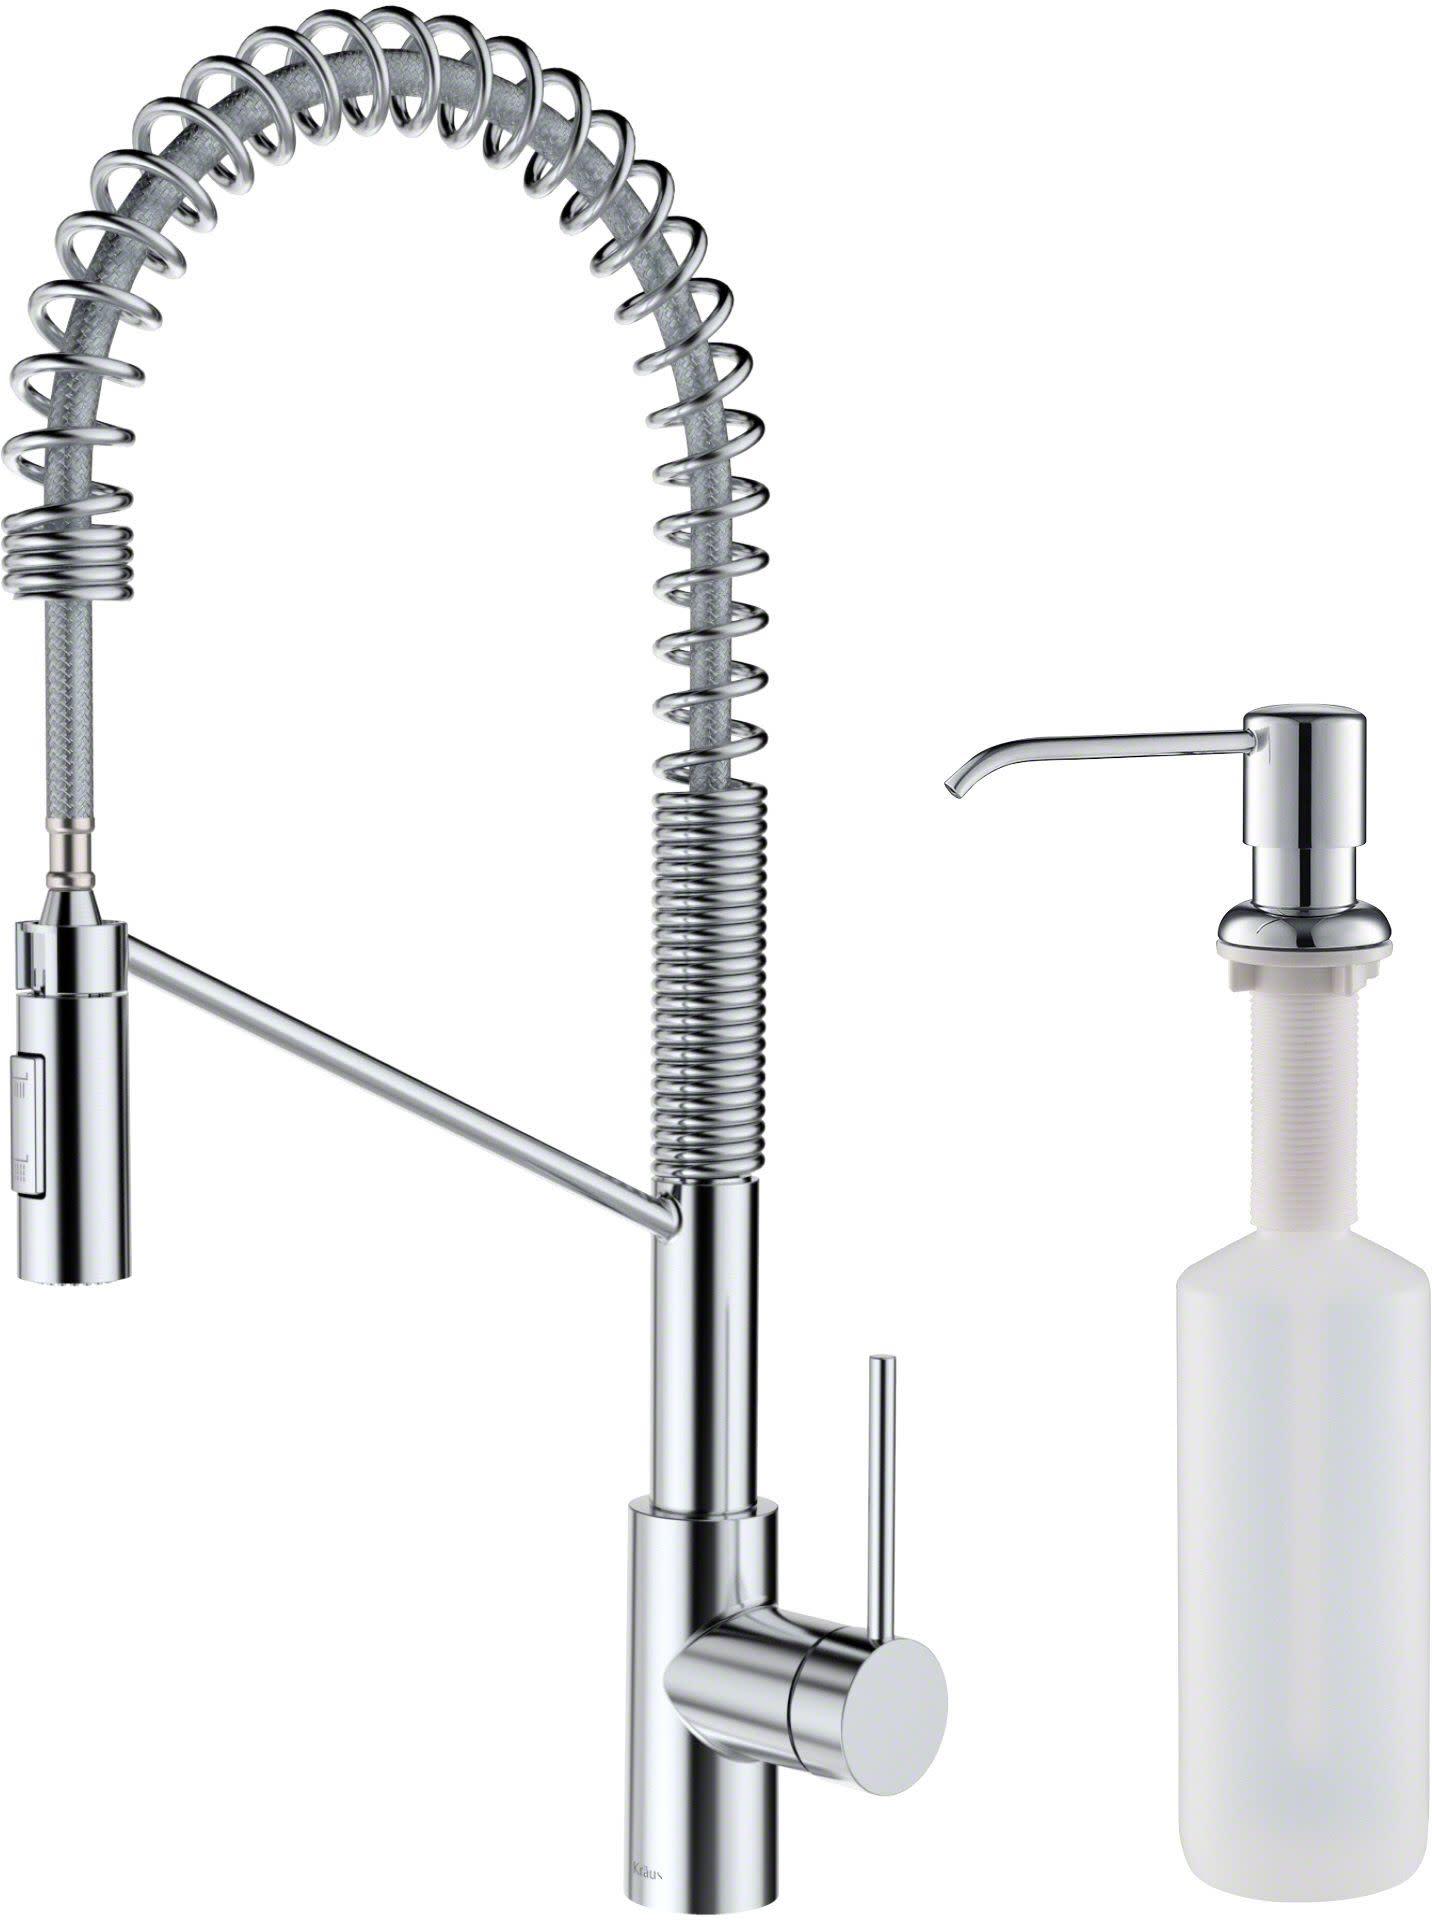 kraus kpf 2631 ksd 53 oletto pull down spray kitchen faucet walmart com